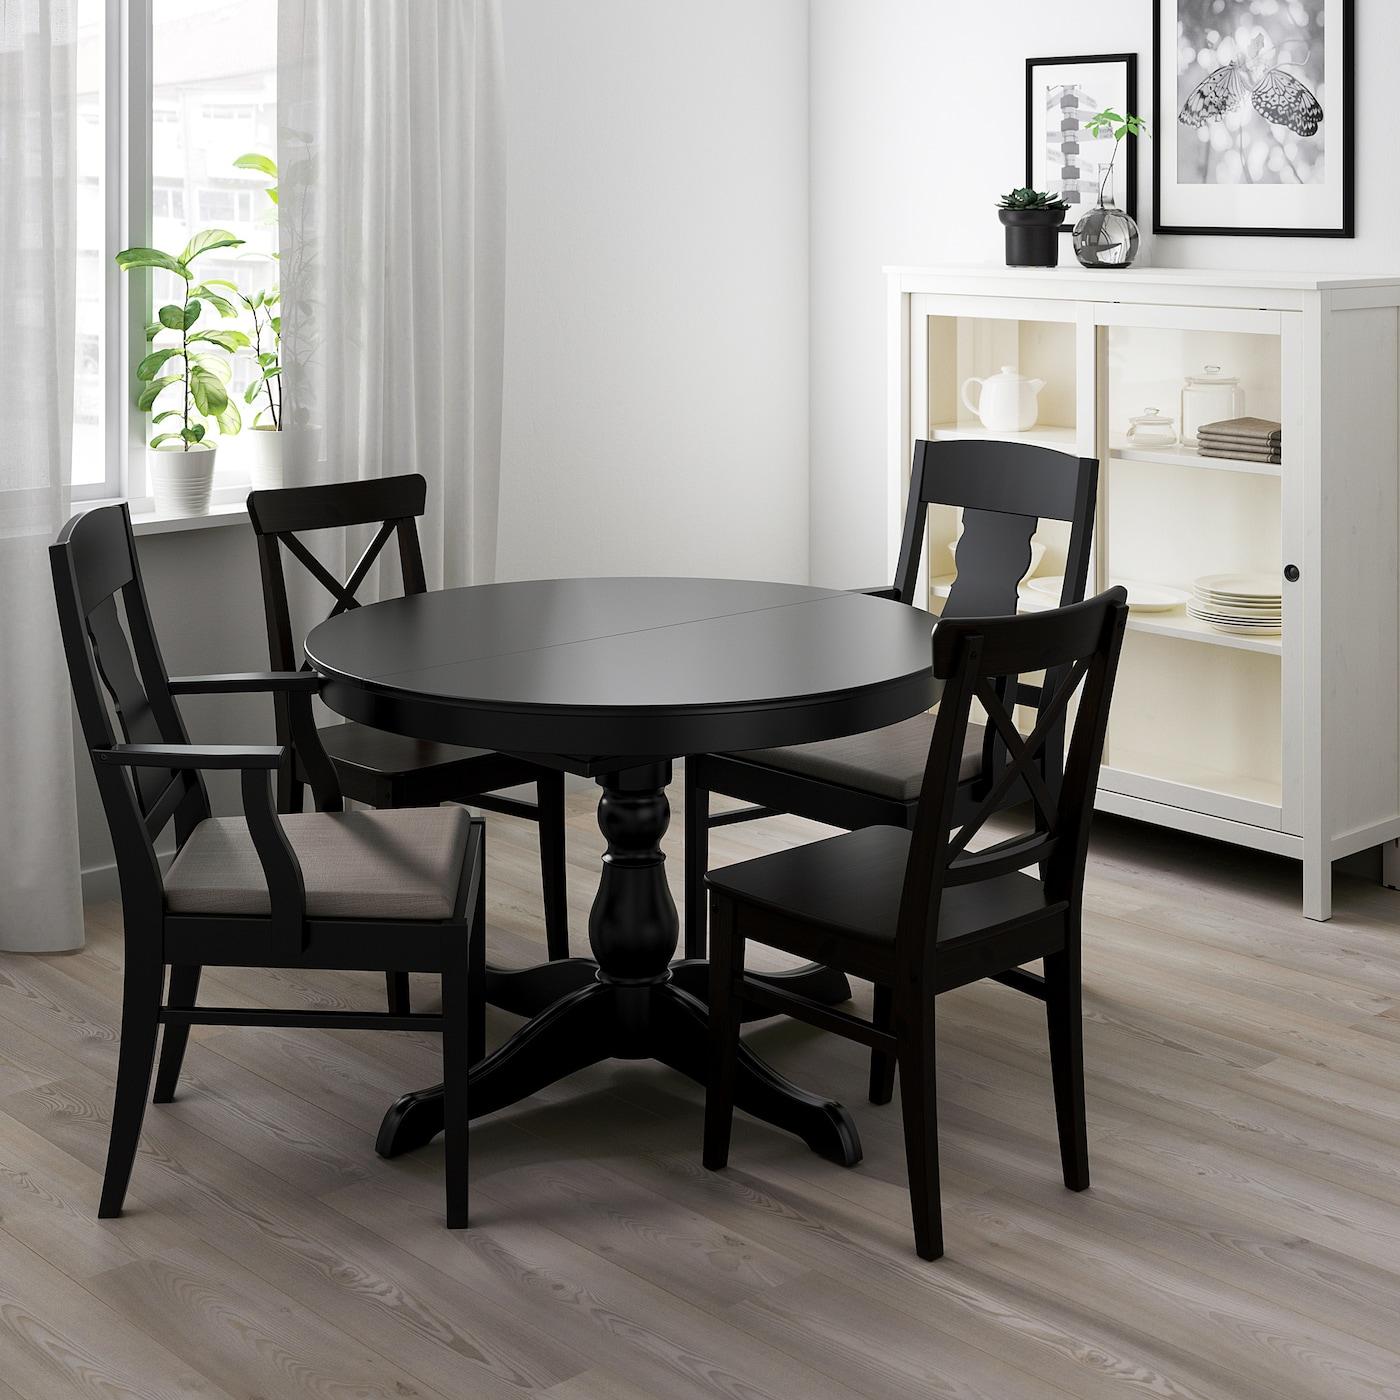 INGATORP black, Extendable table, Max